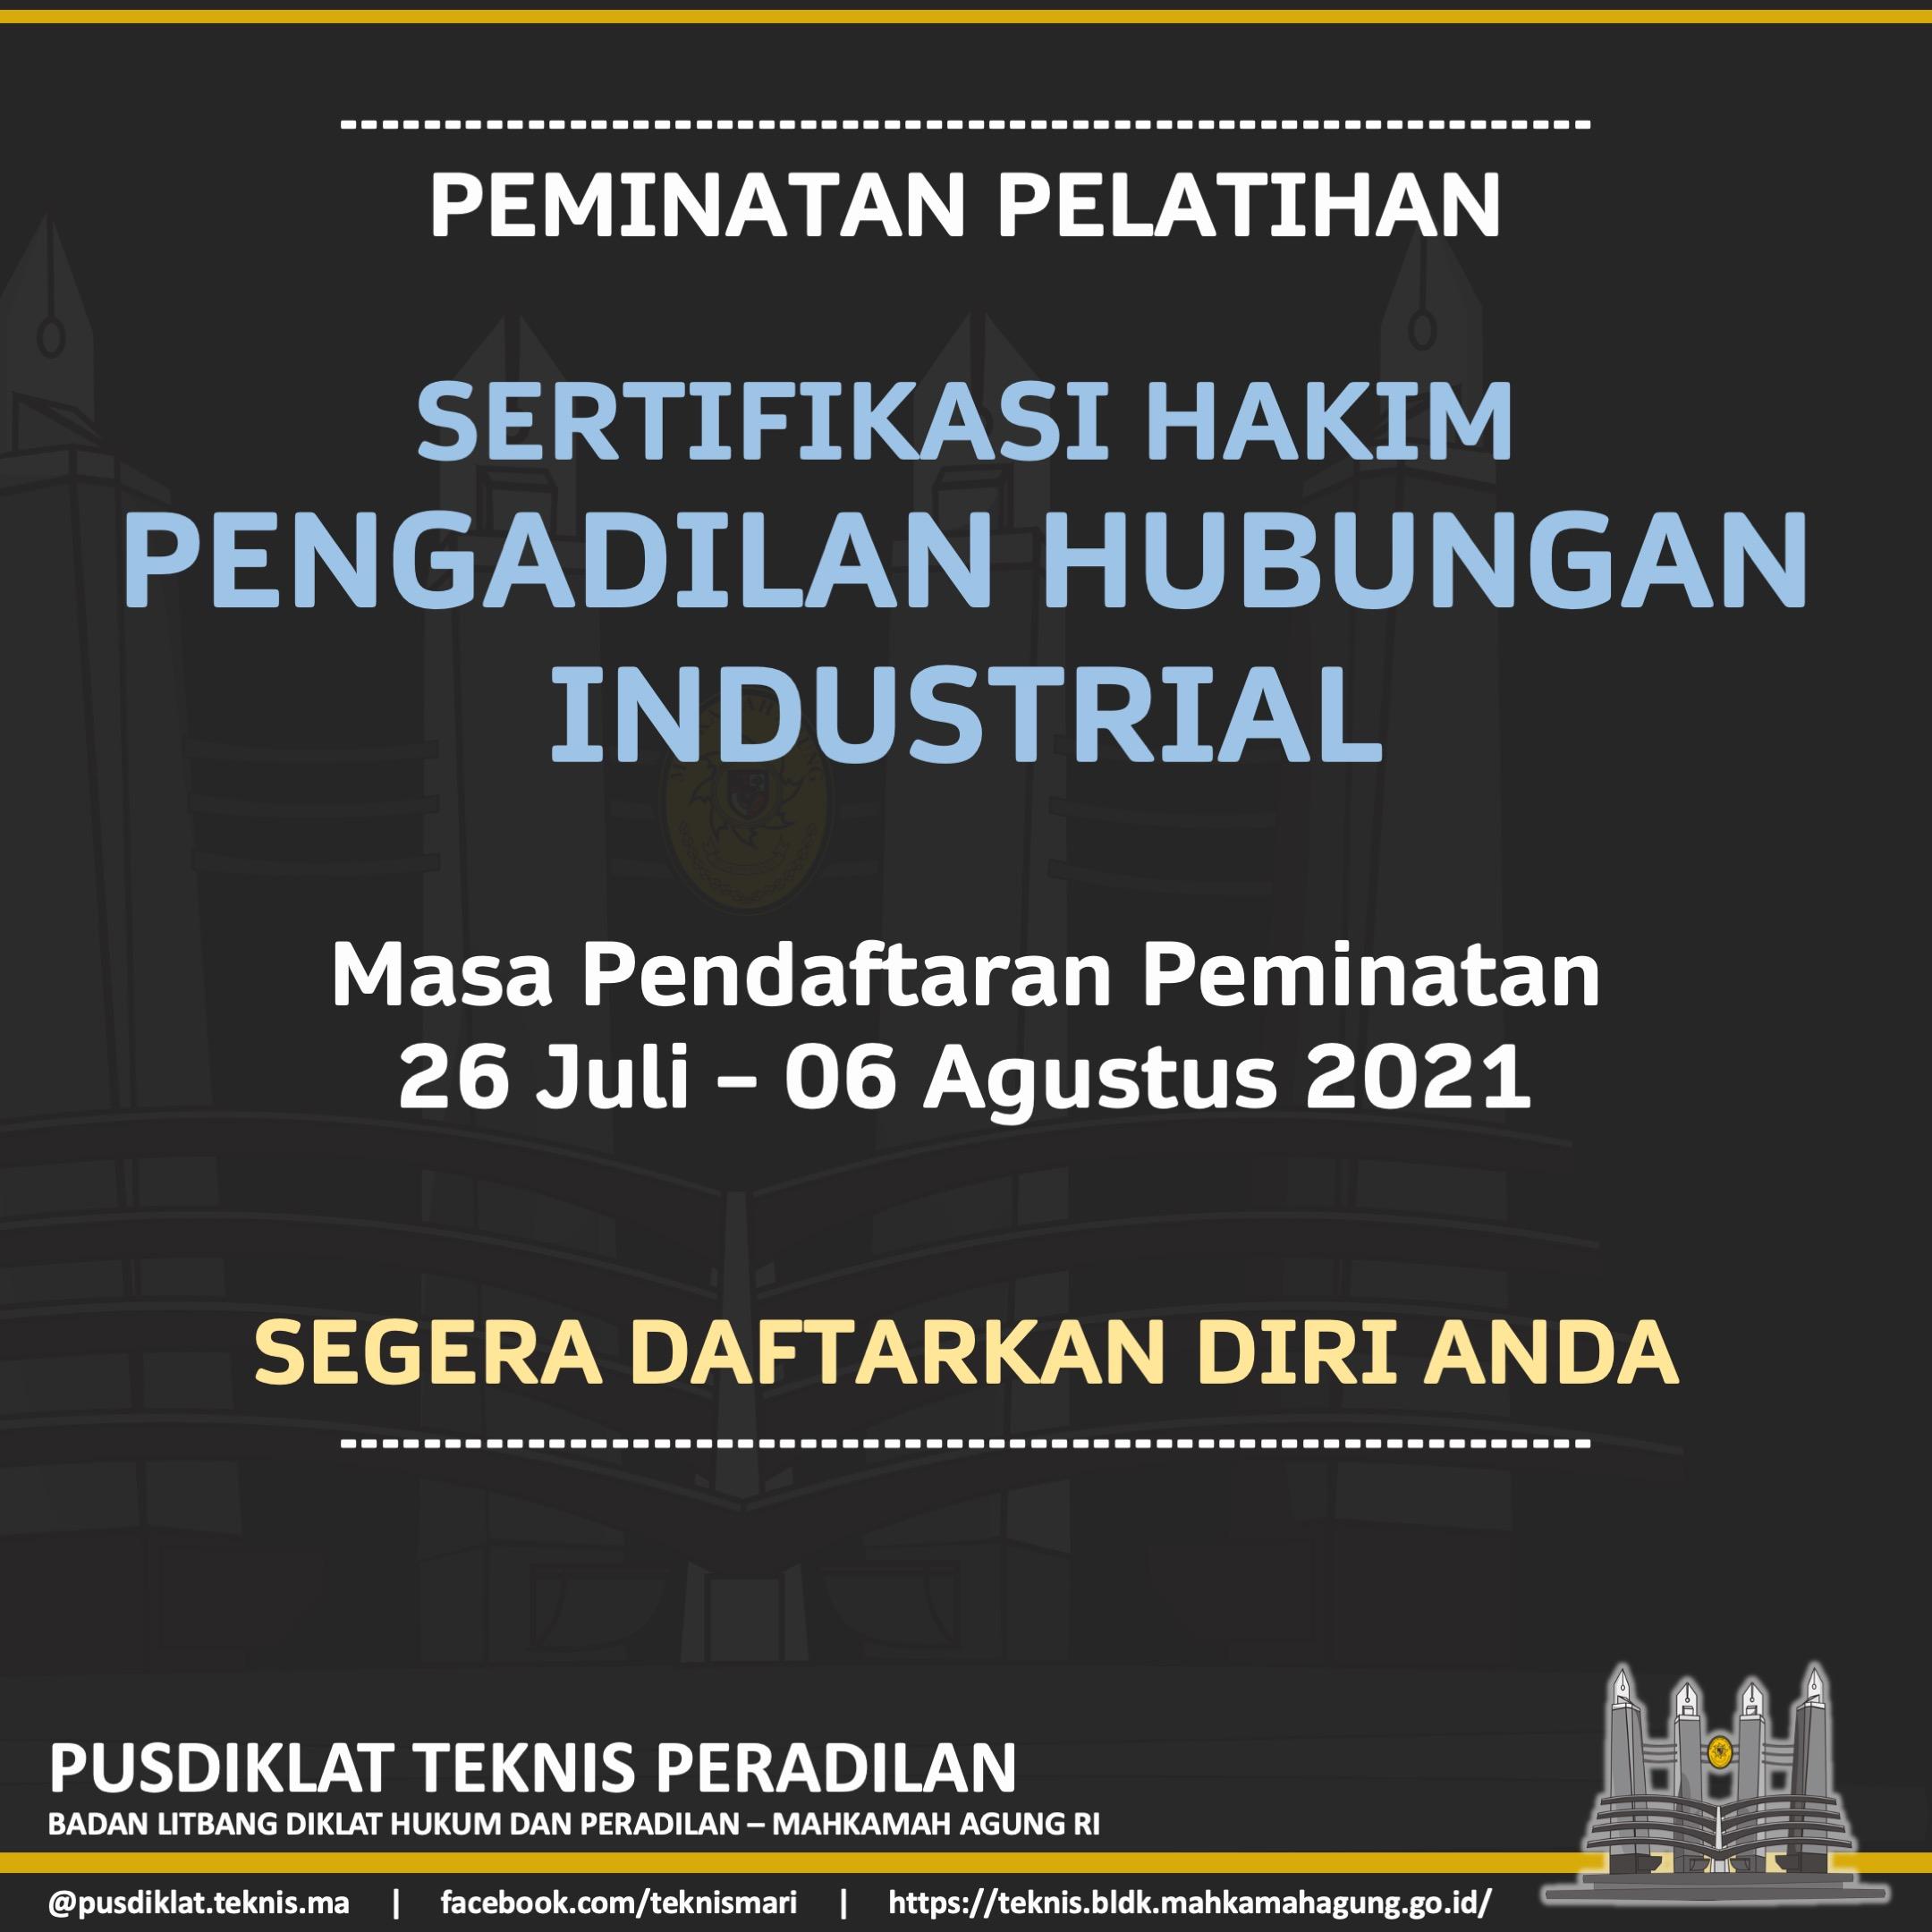 Peminatan Sertifikasi Hakim Pengadilan Hubungan Industri